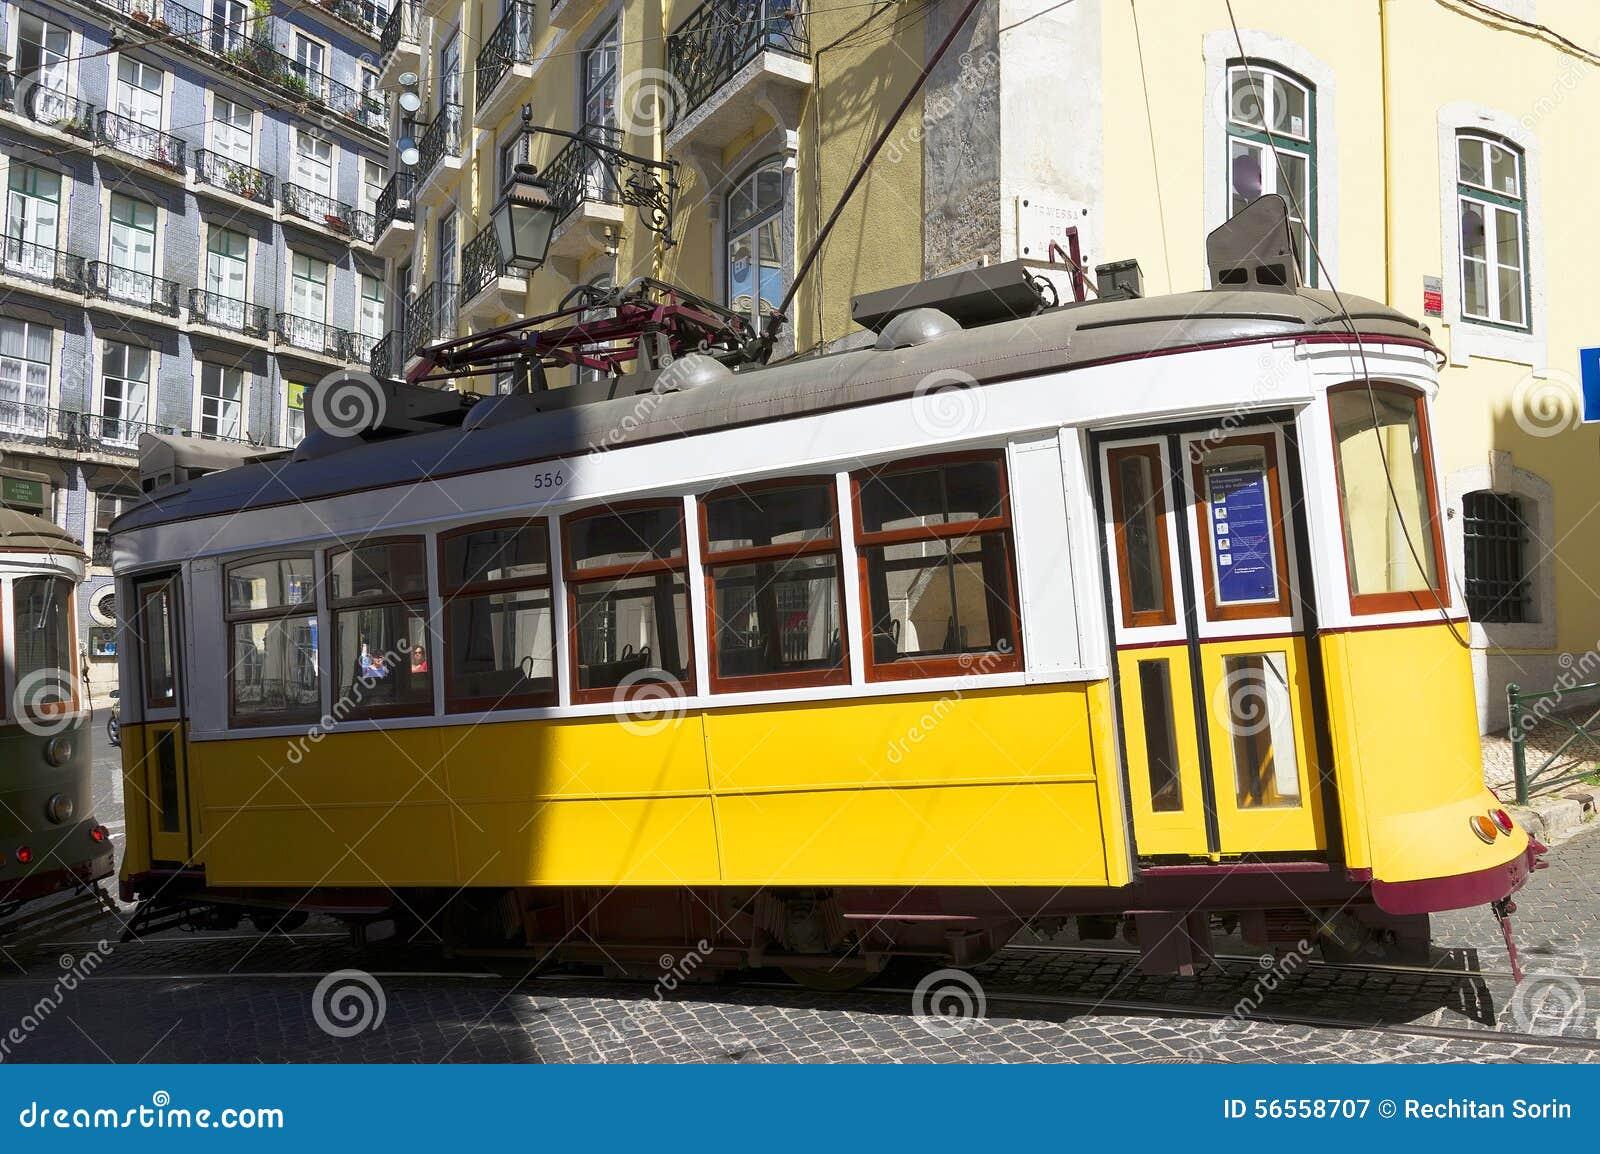 Download Αρχιτεκτονική λεπτομέρεια στη Λισσαβώνα Στοκ Εικόνα - εικόνα από ορίζοντας, άνθρωποι: 56558707